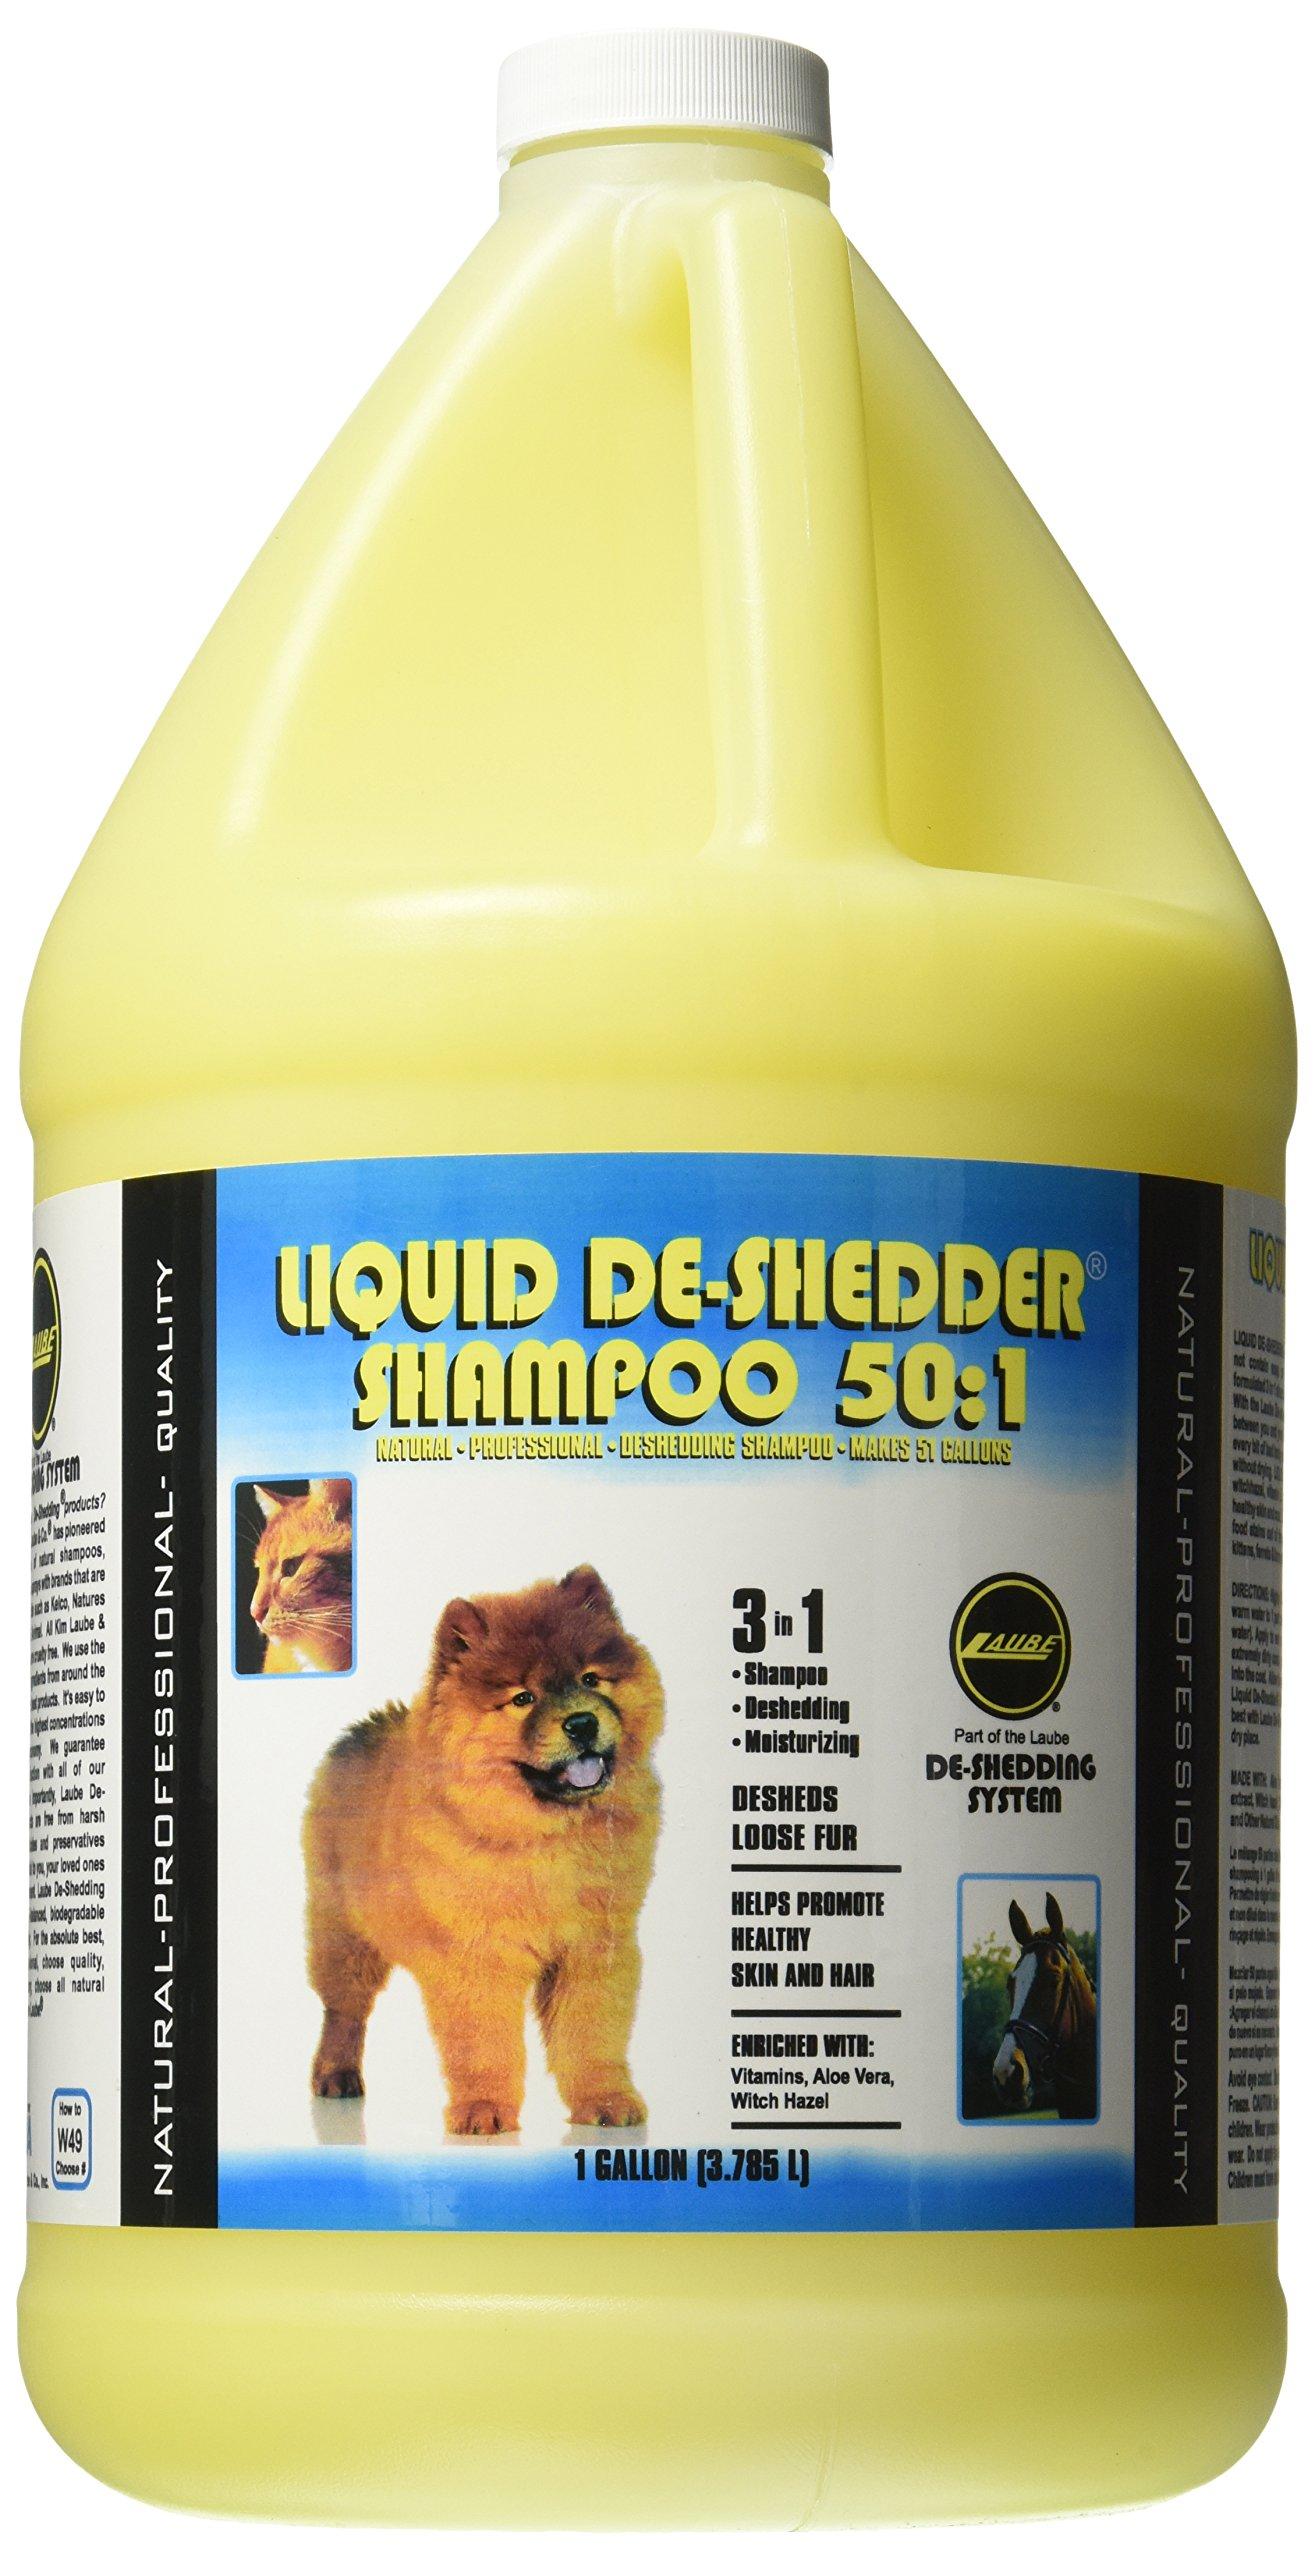 Wild Animal Liquid De-Shedder 50:1 Shampoo Gallon